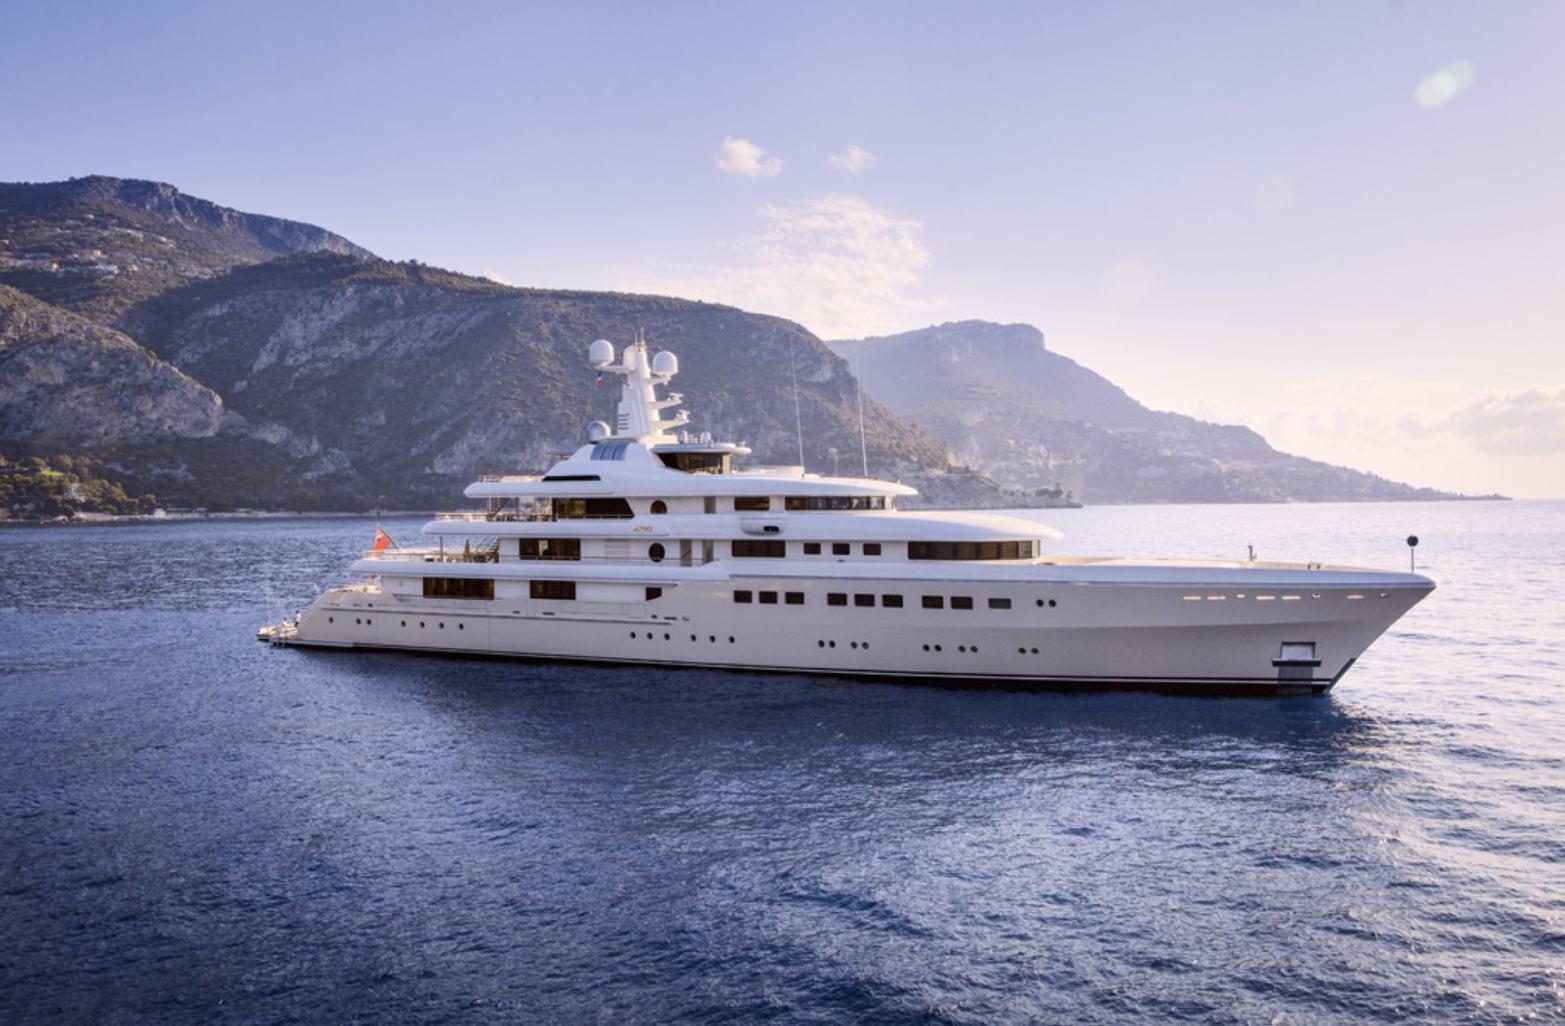 superyacht KIBO cruising on a Mediterranean yacht charter